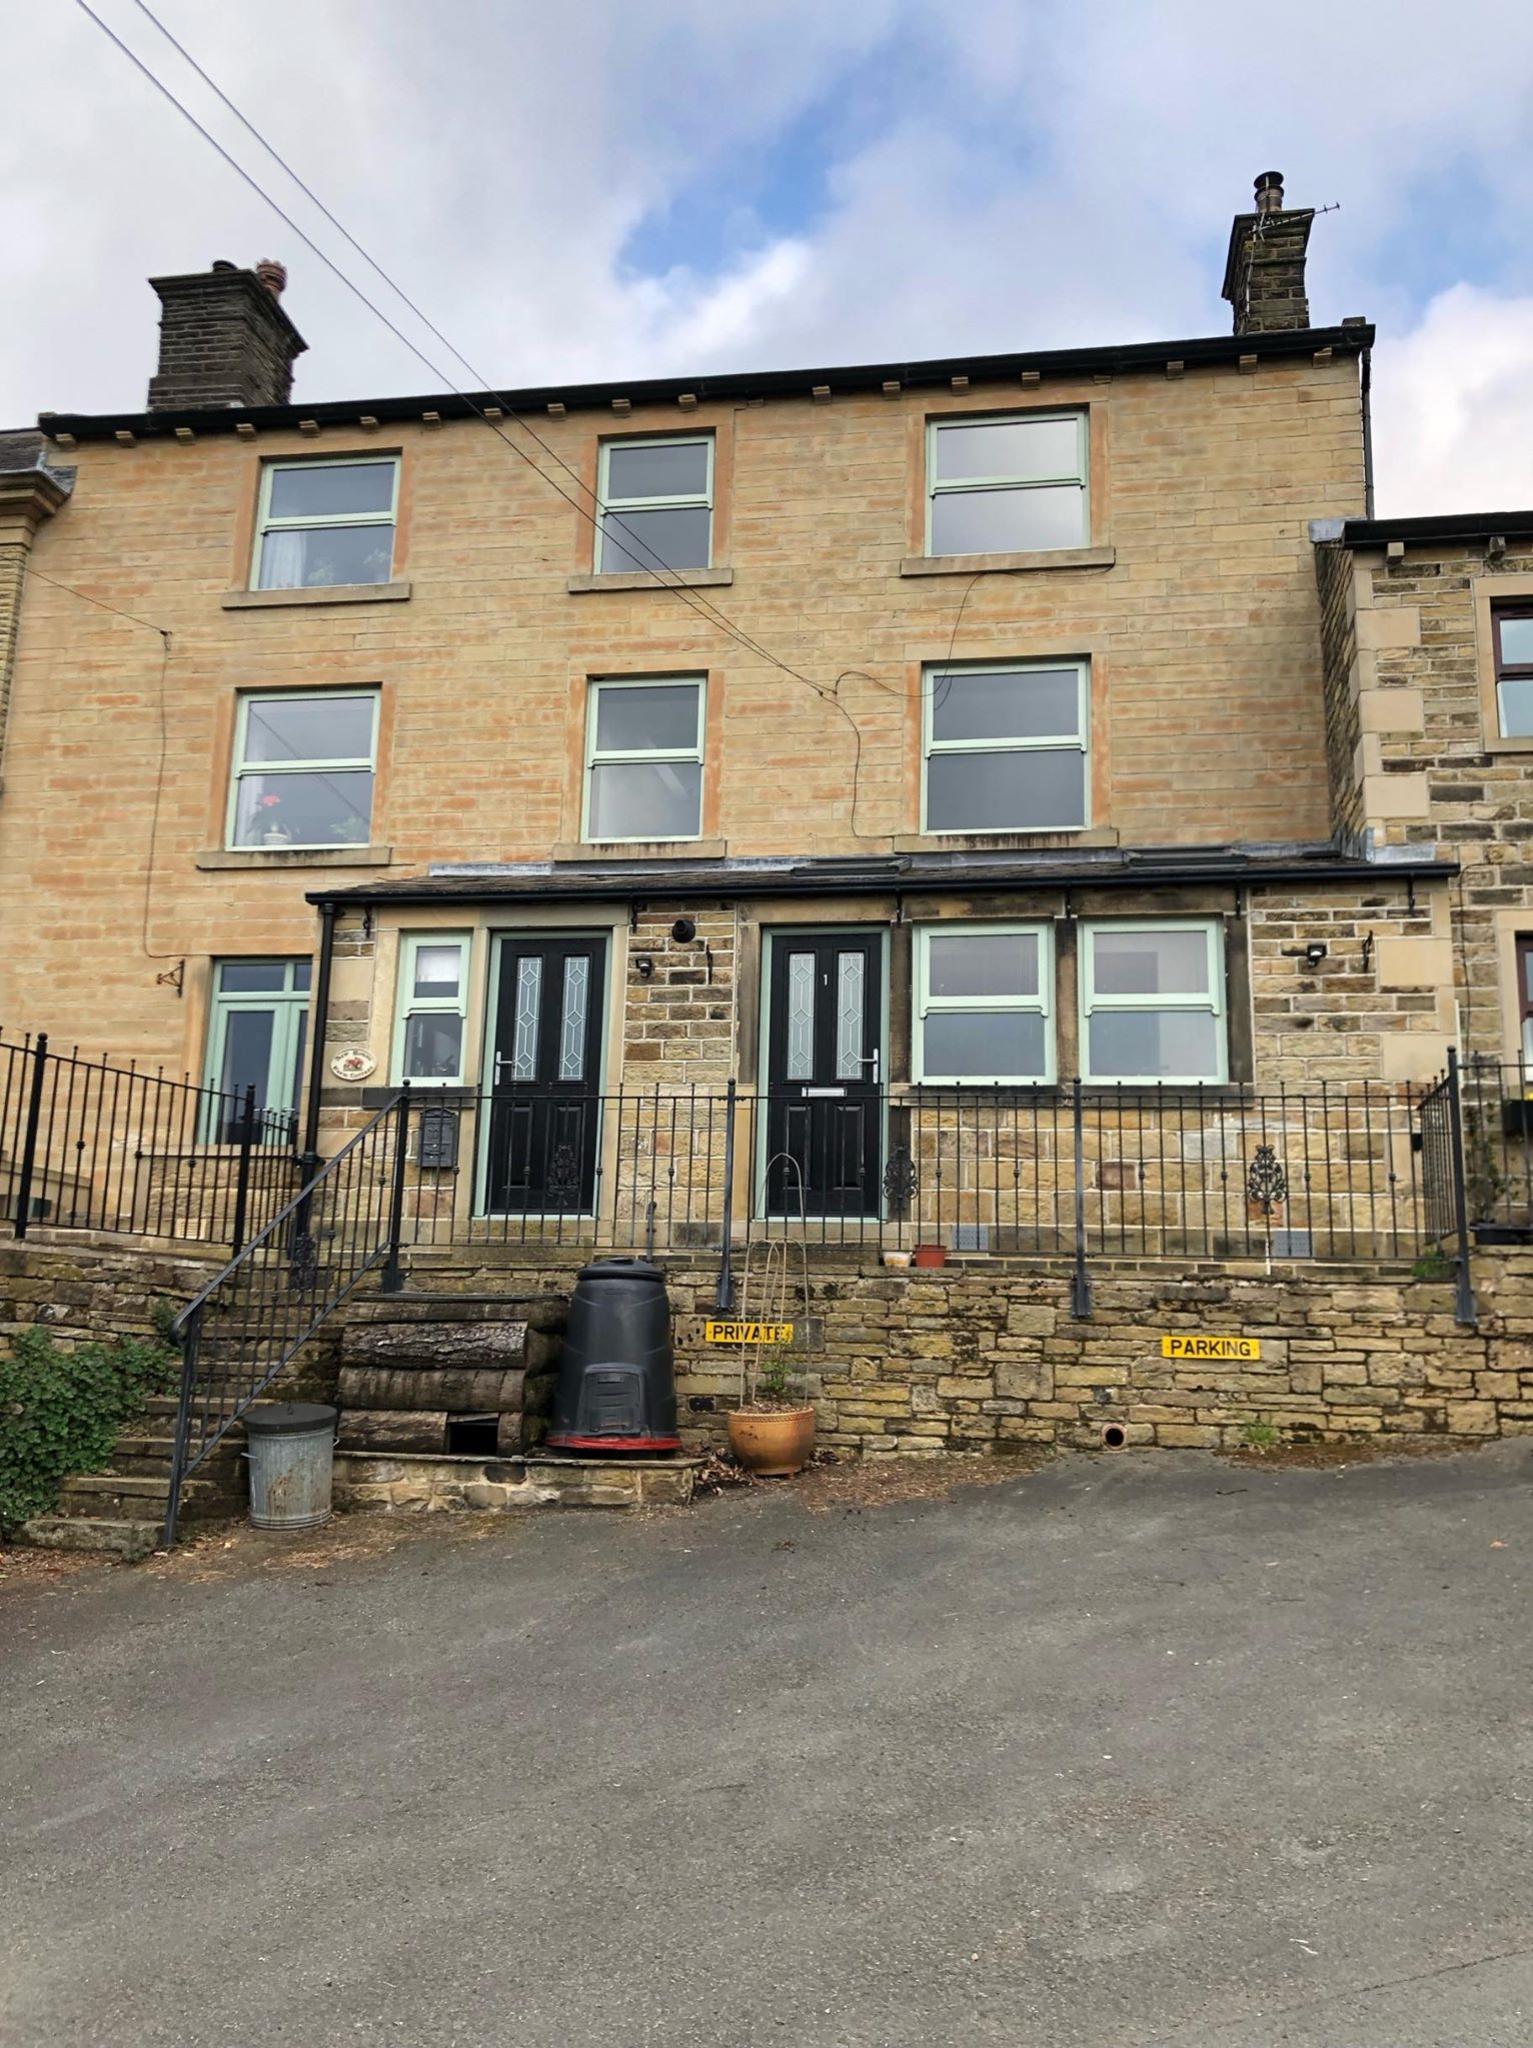 1 New House Farm, Shaw Lane,  Hinchliffe Mill HD9 2PY